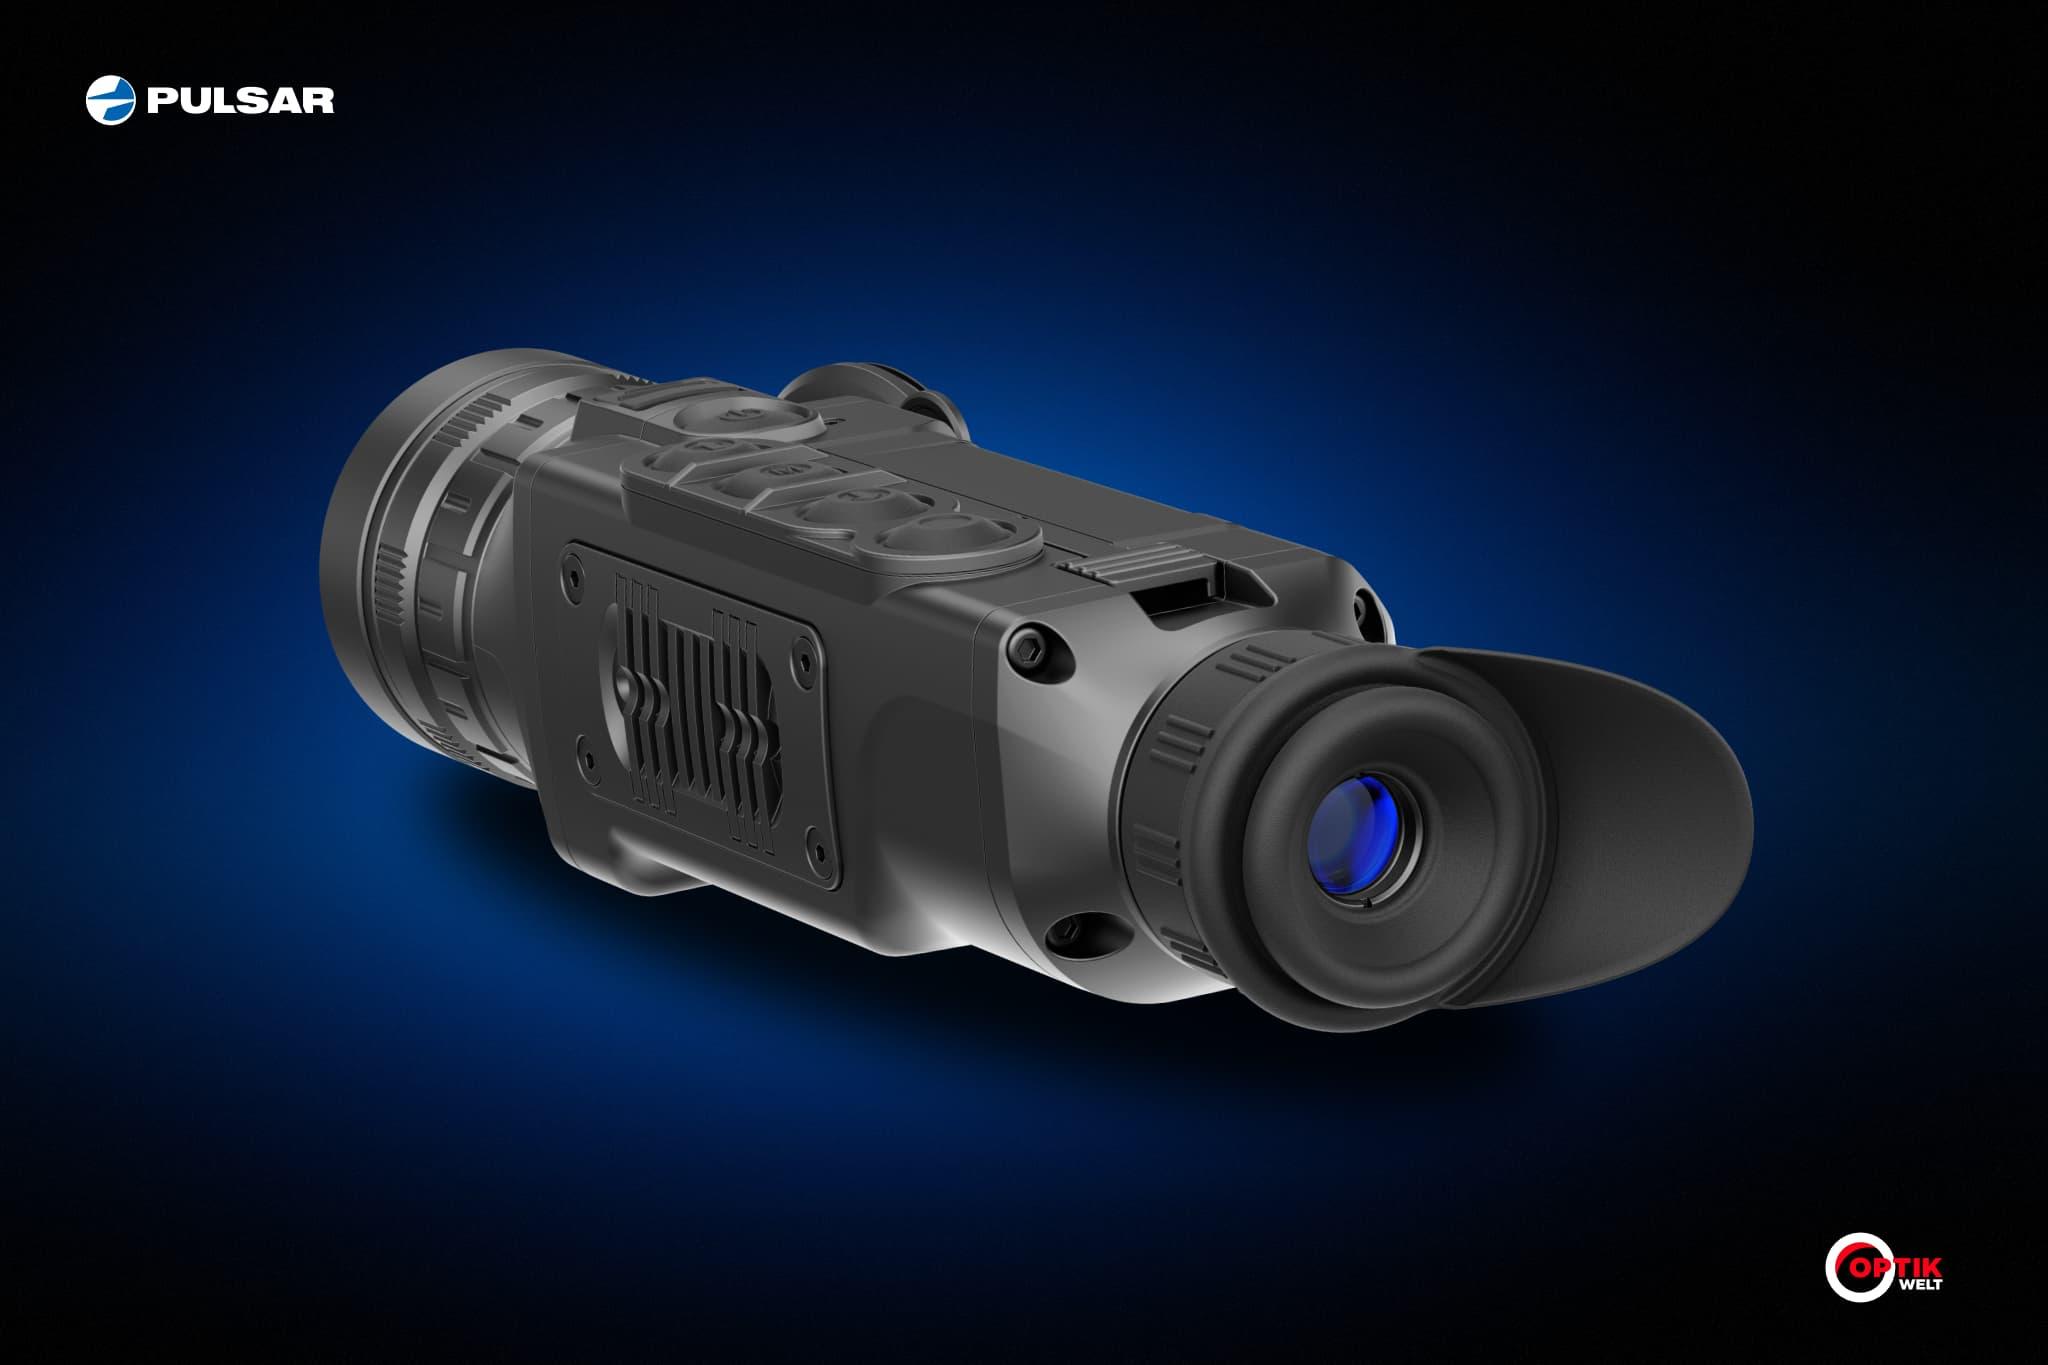 Termokaamera Pulsar Helion XQ50F